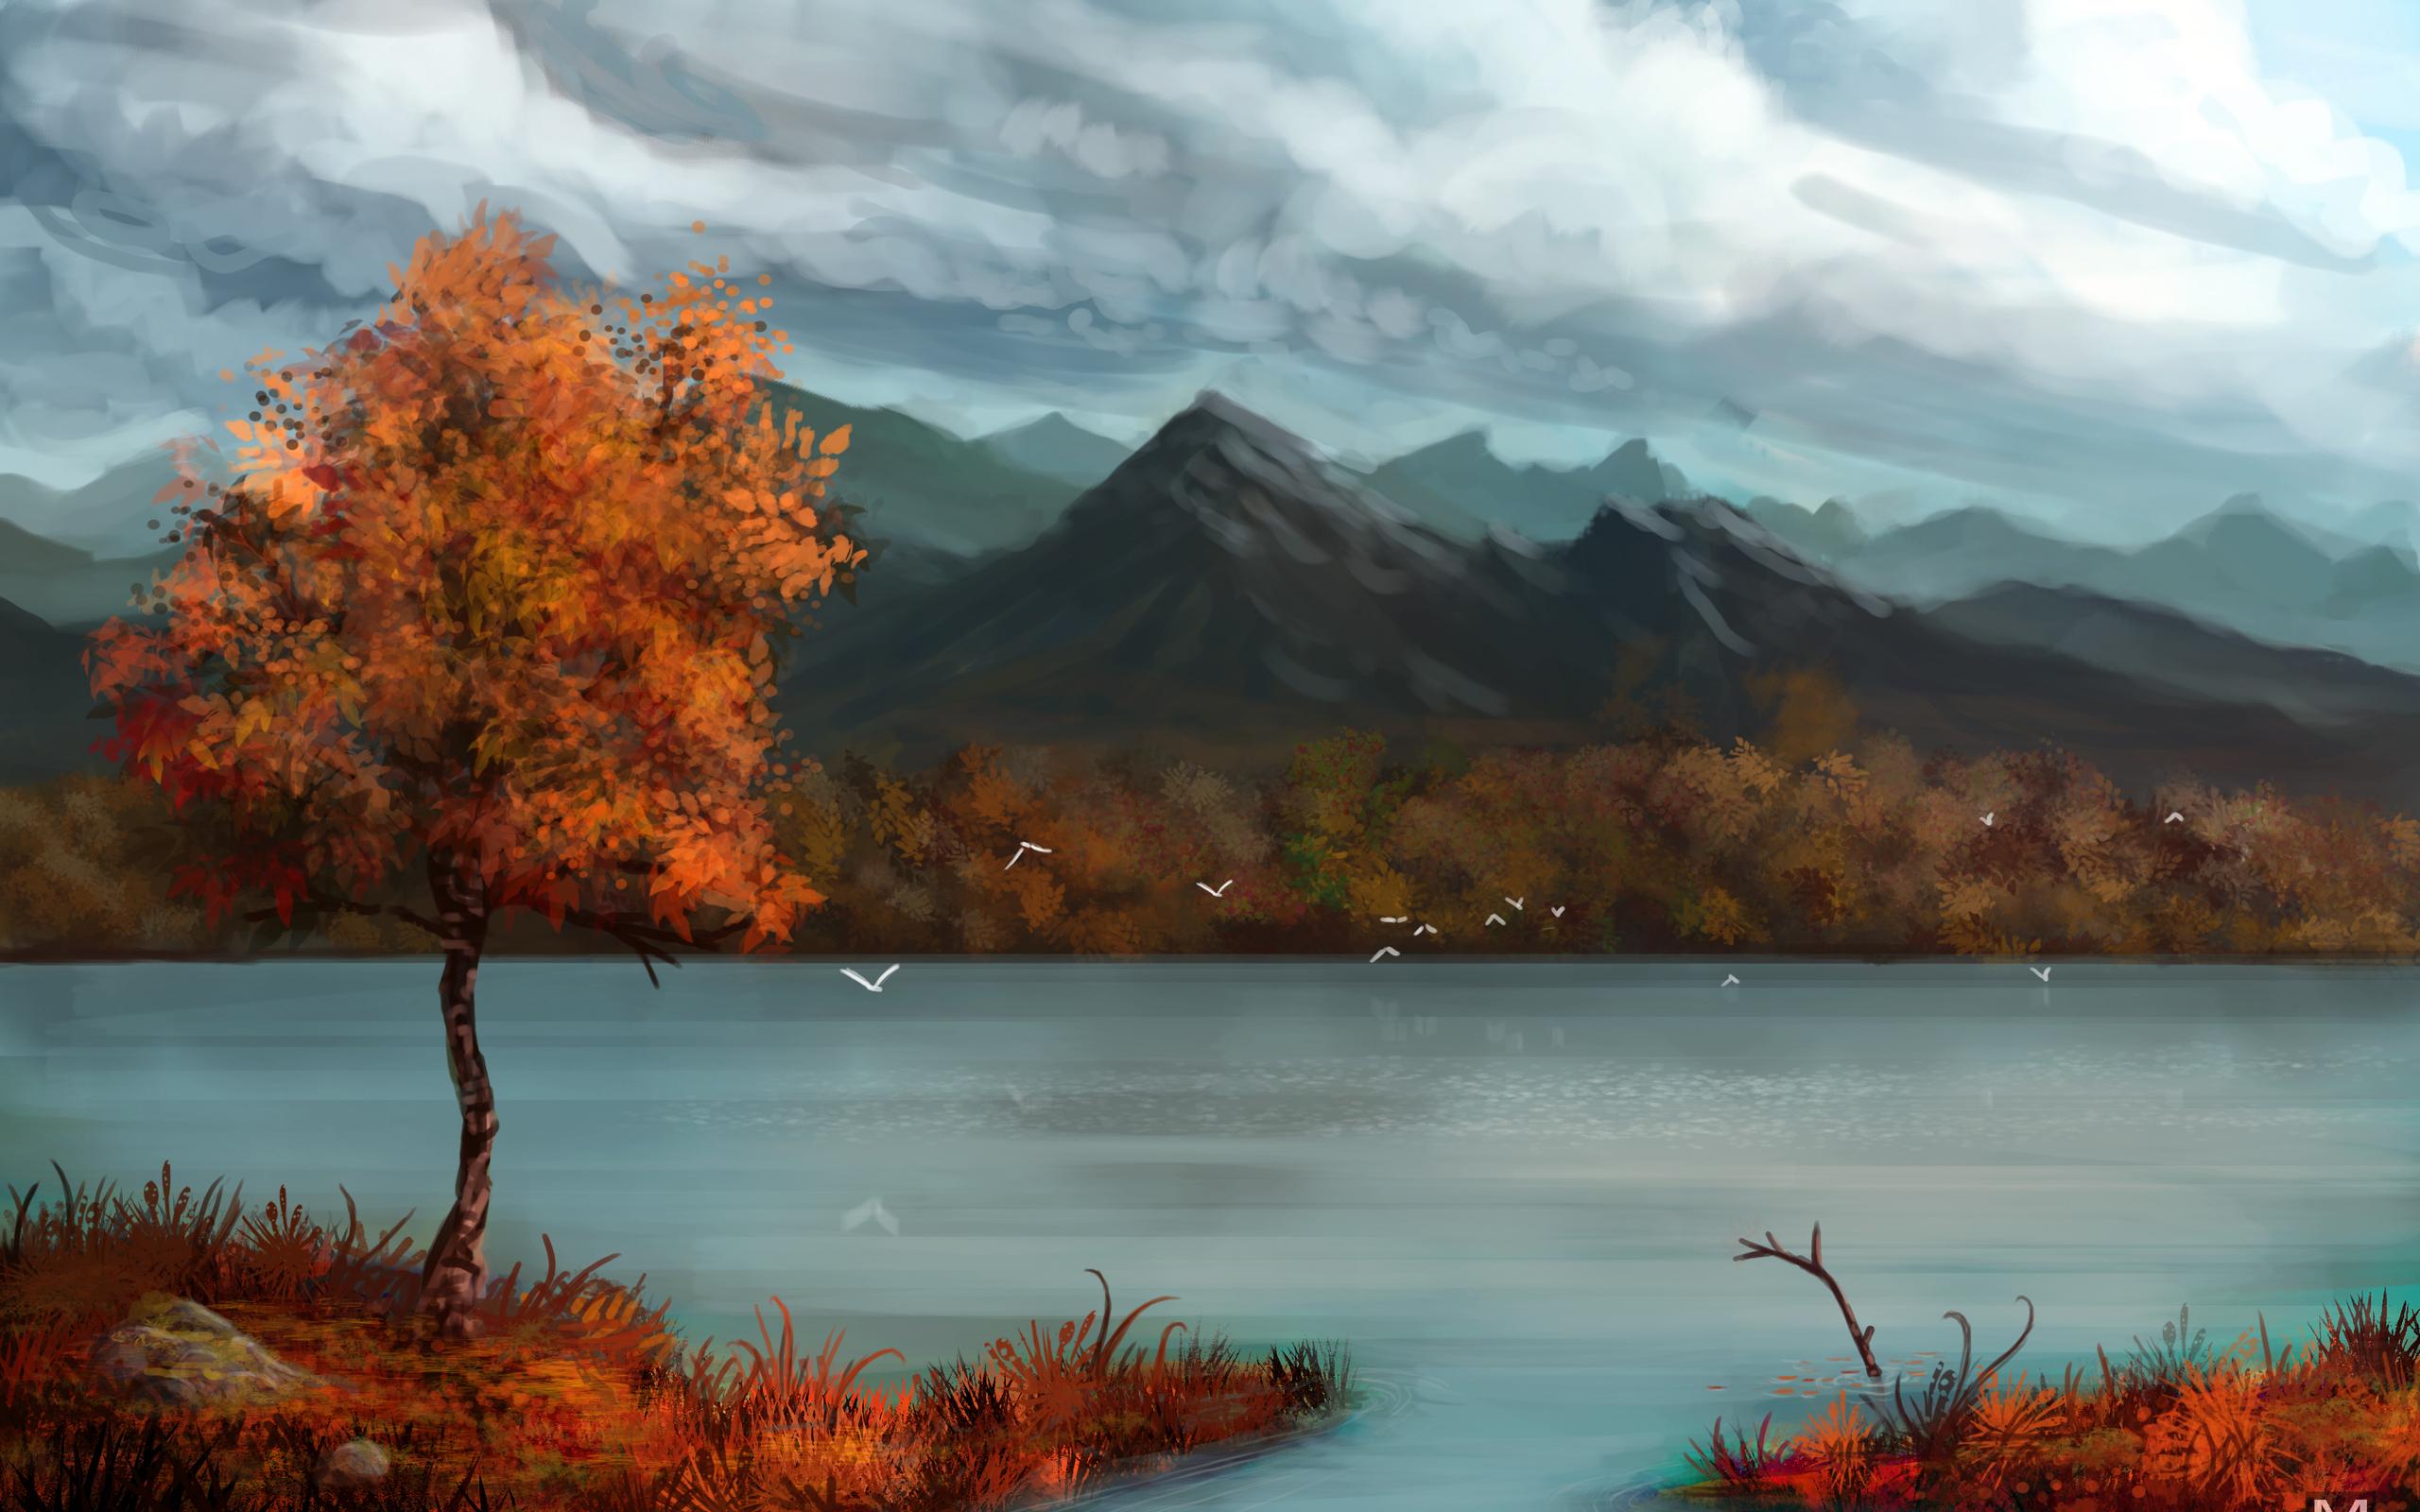 Nature hd wallpaper background image 2560x1600 id - Nature wallpaper 2560x1600 ...